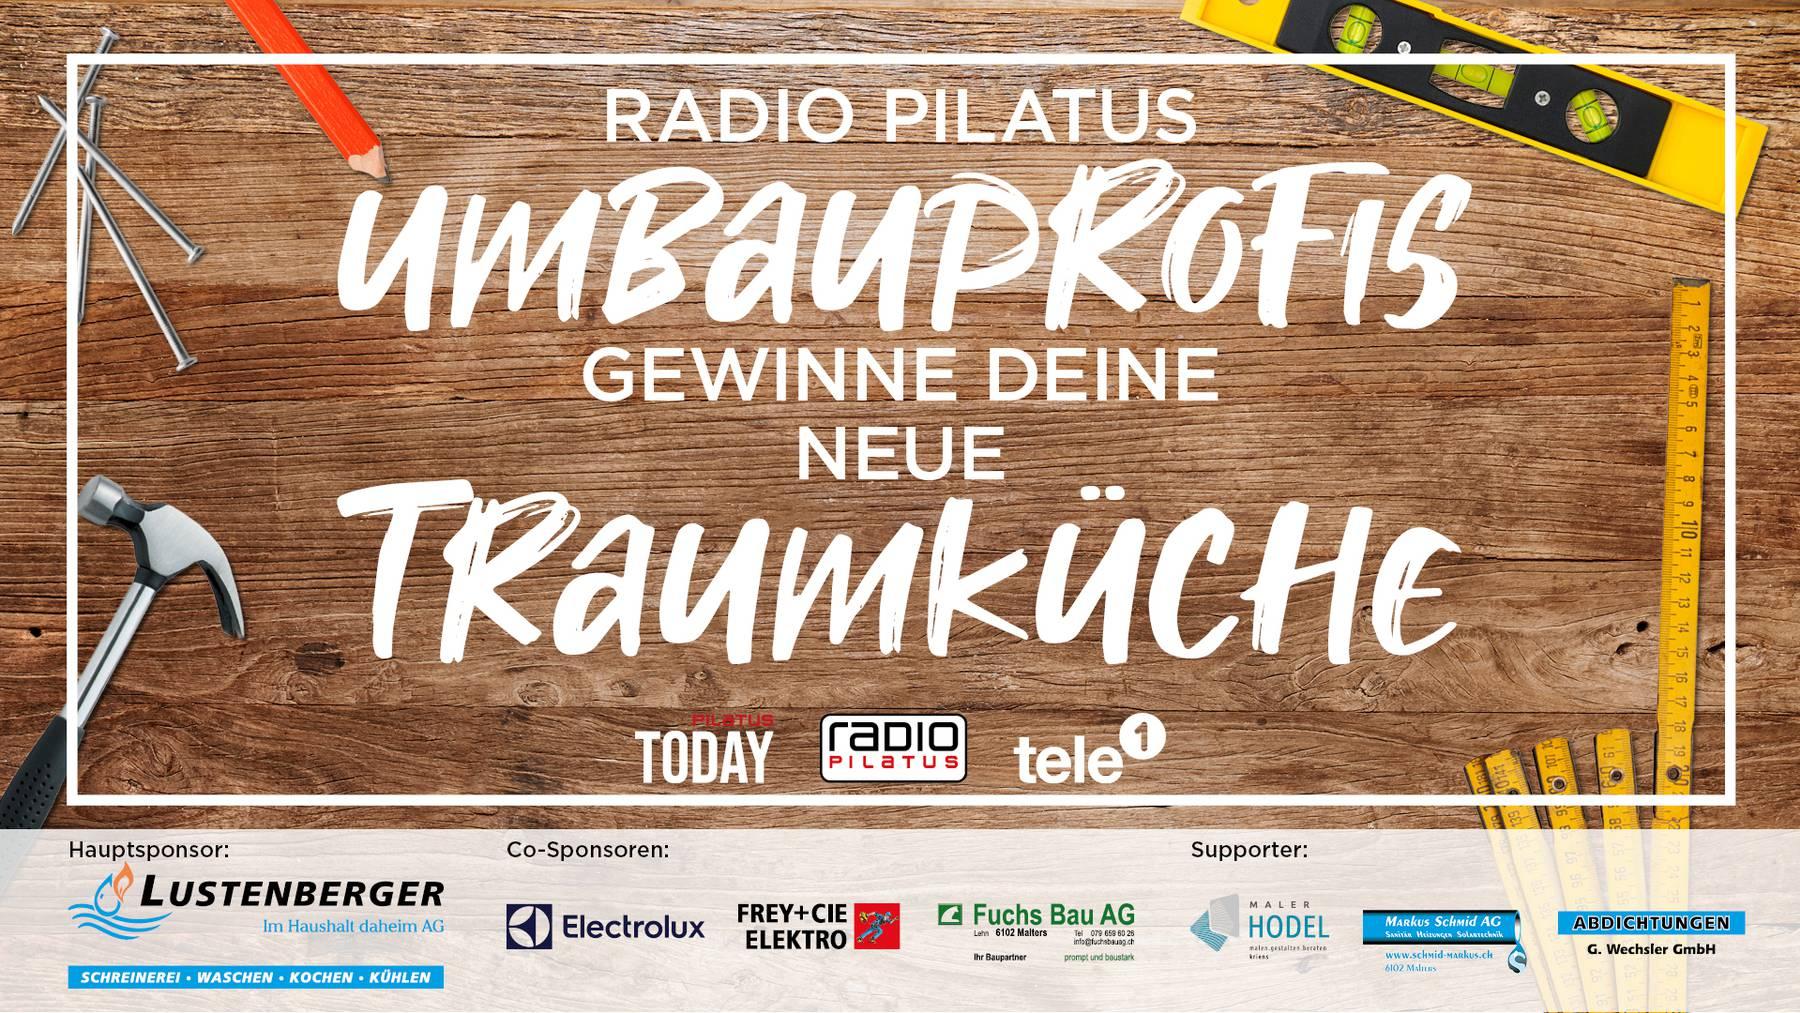 Radio Pilatus Umbauprofis